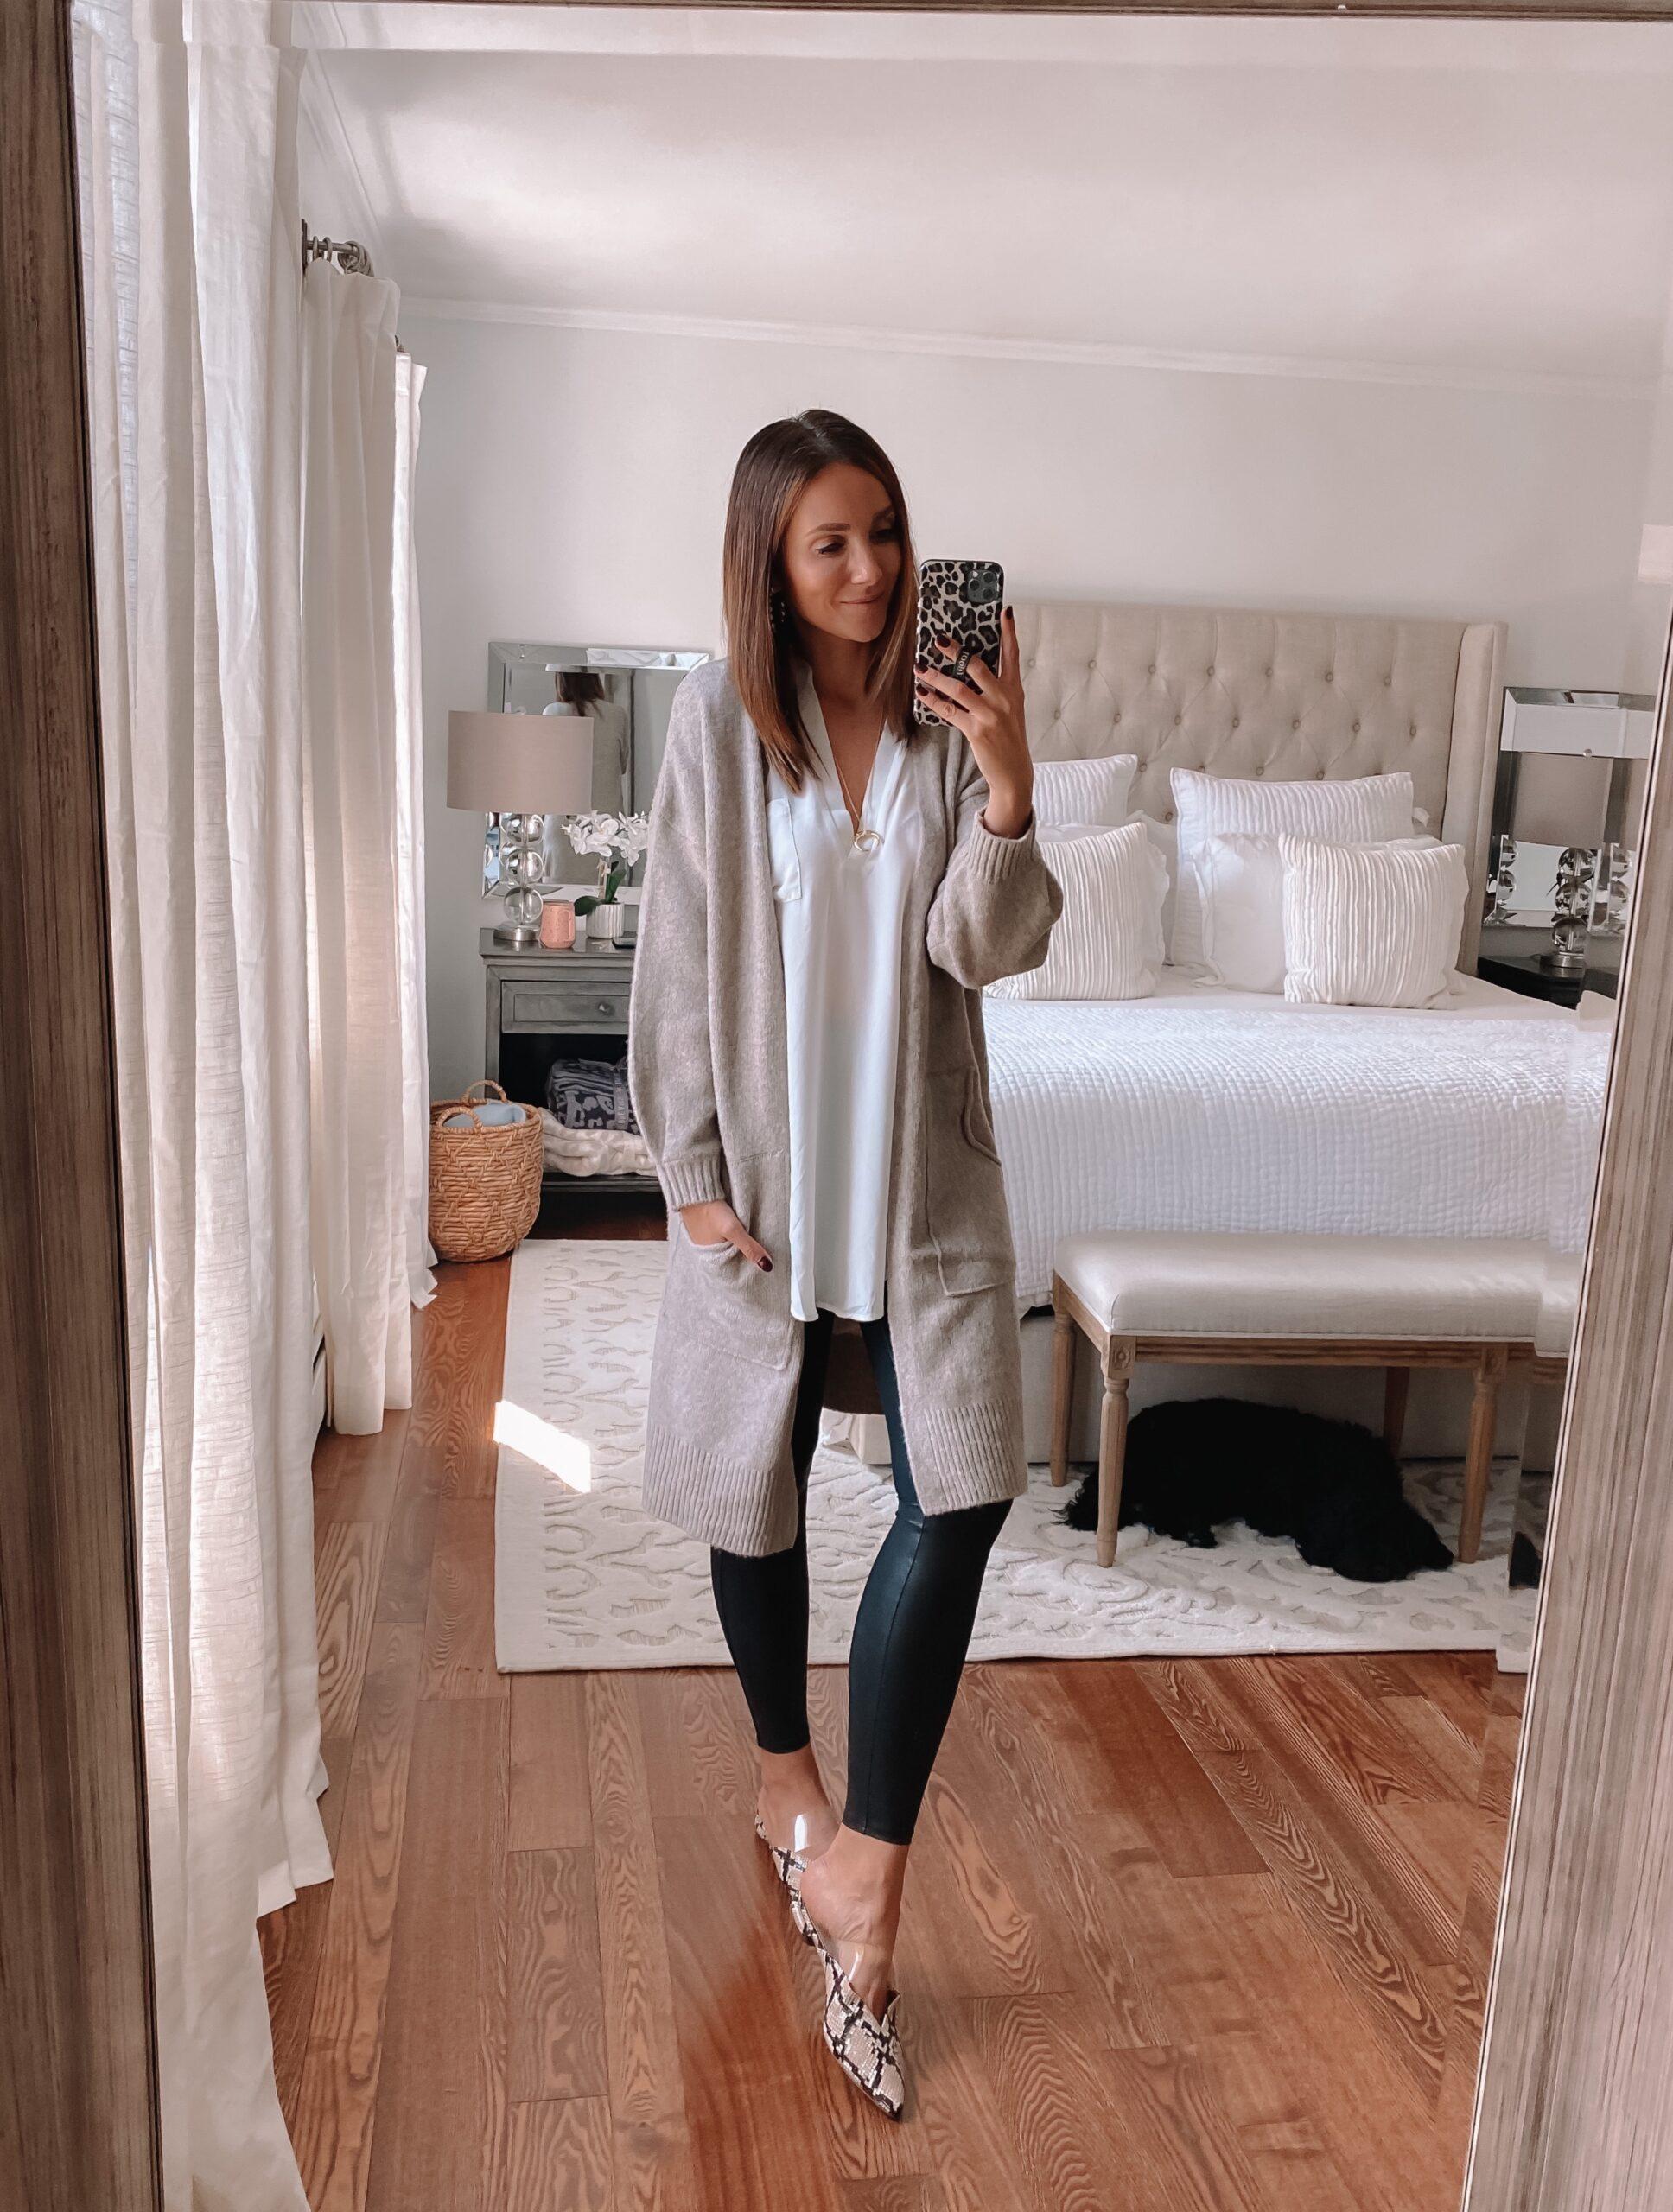 workwear, teacher outfit idea with leggings